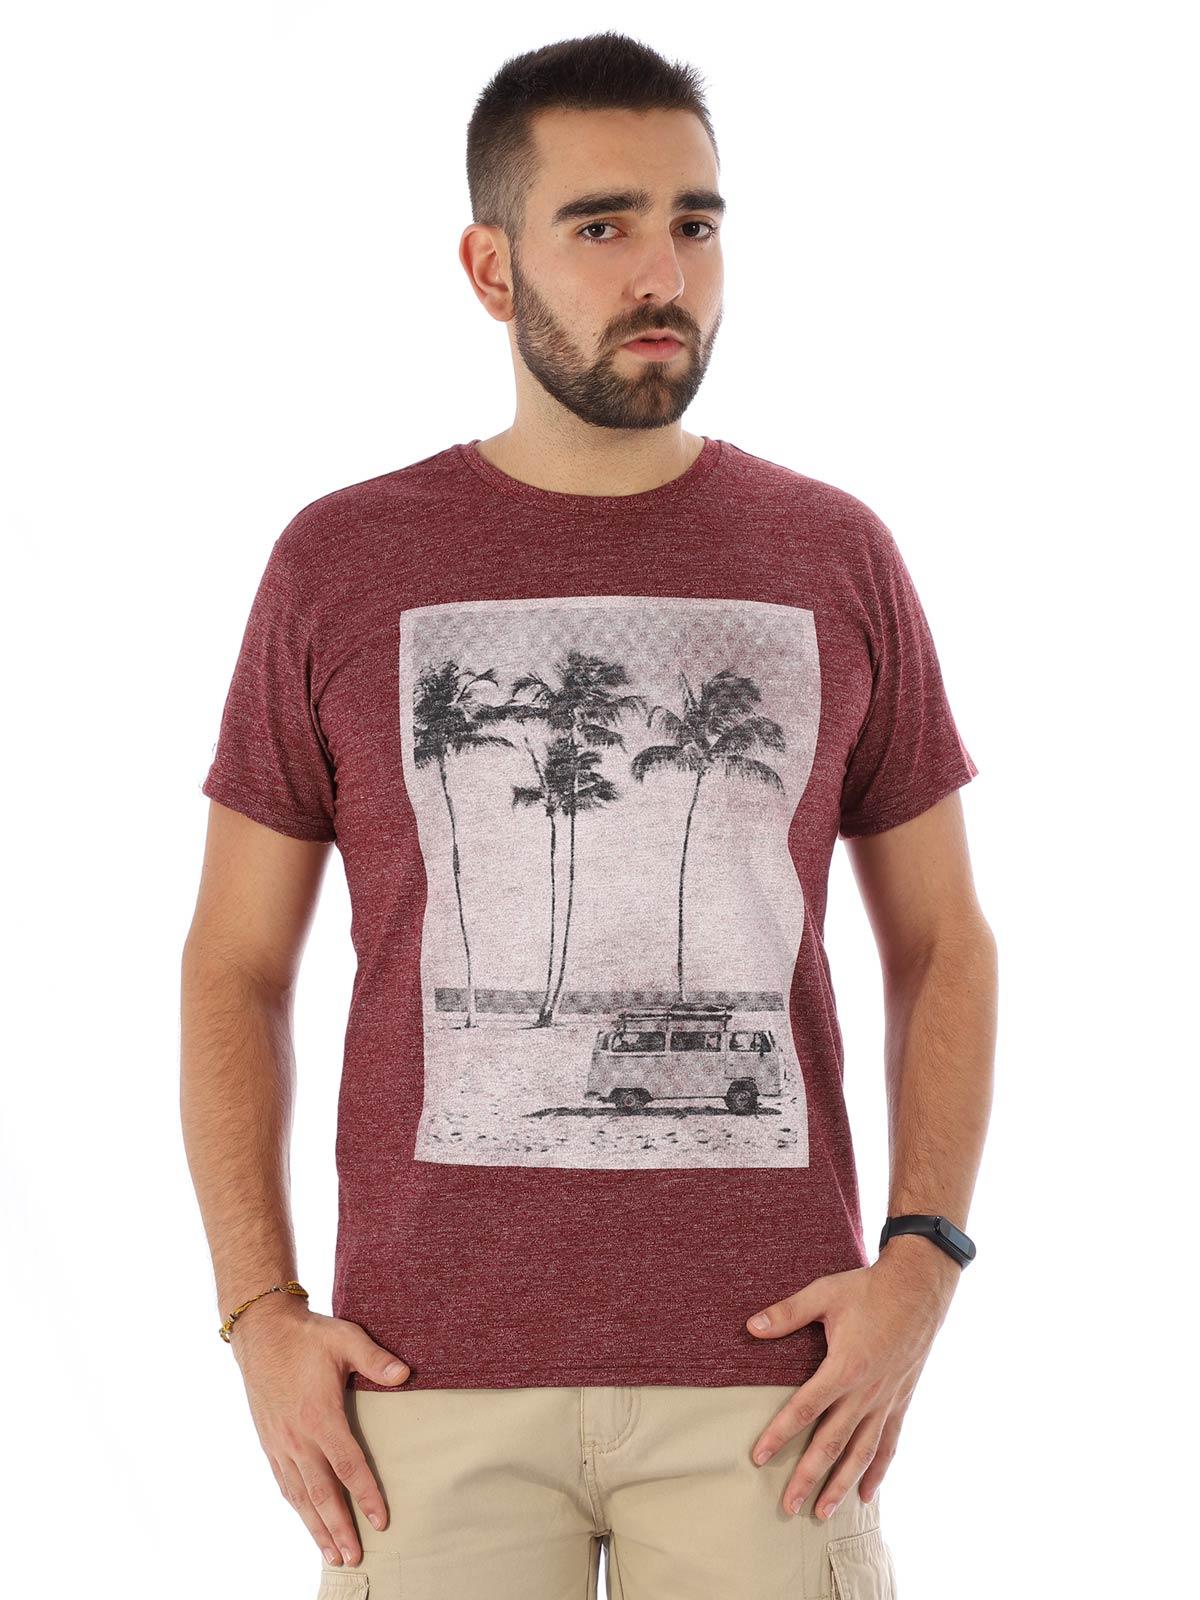 Camiseta Masculina Slim Fit Manga Curta Uno Bordo